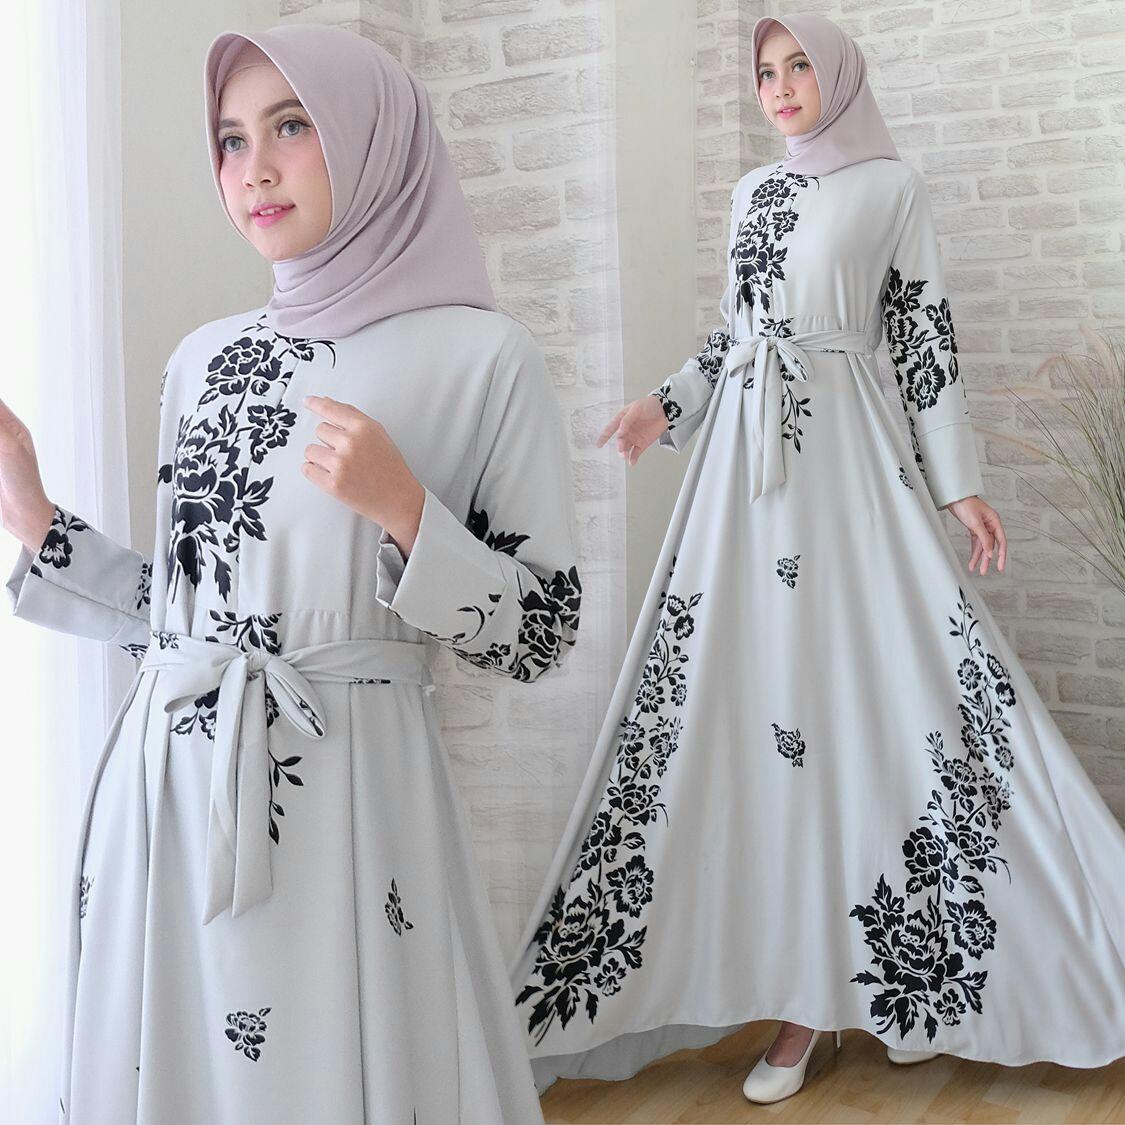 Snowshop Gamis Syari Zeria - Baju Muslim / Fashion Wanita / Baju wanita / Baju Gamis / Busui / Gaun / Maxmara  / XL / Jumbo / Syari